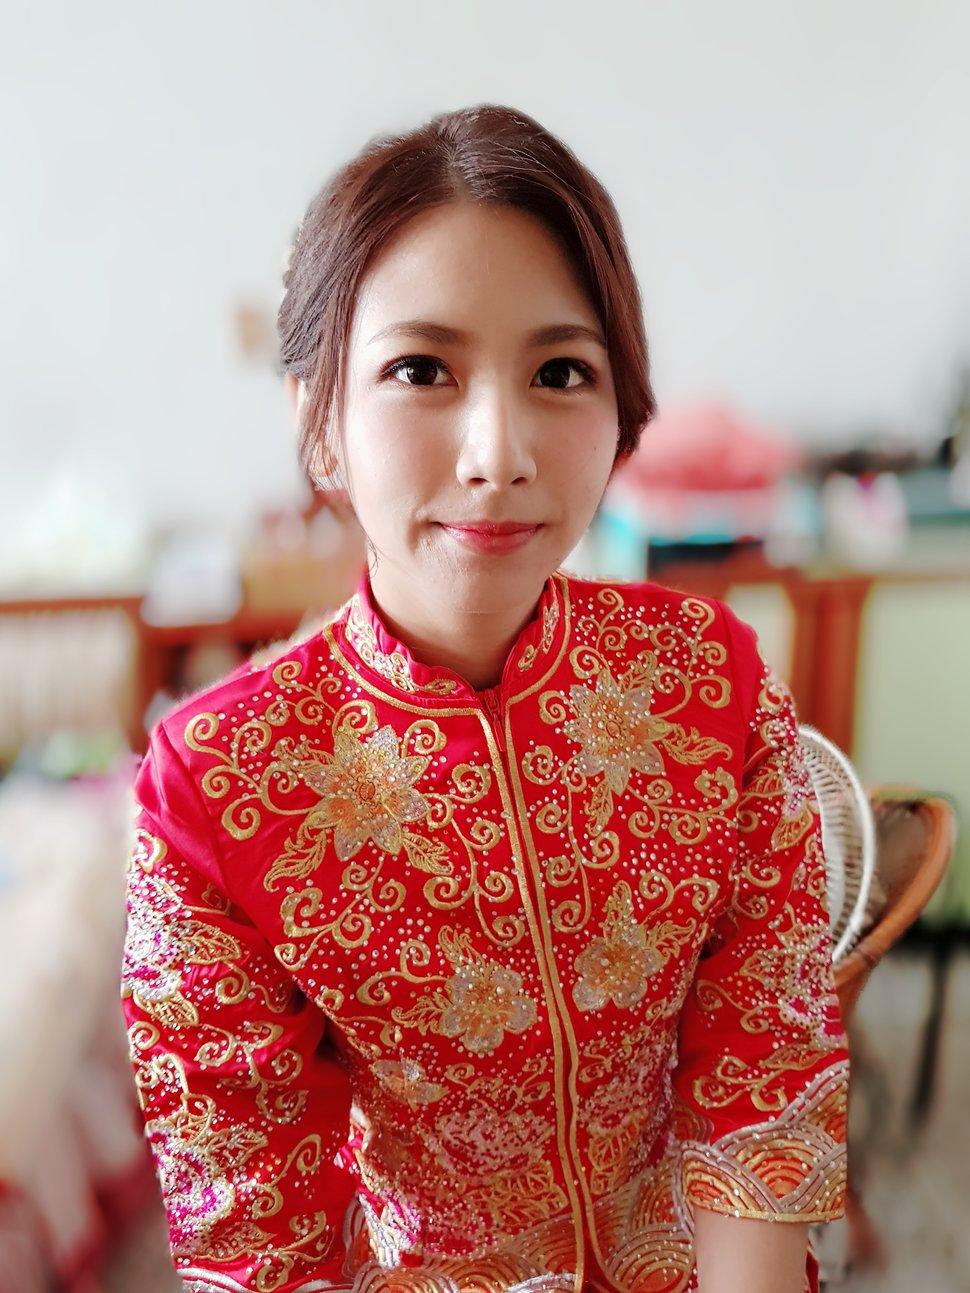 serin新娘秘書中式龍鳳褂造型2 - Serin Style曦式玩美造型《結婚吧》